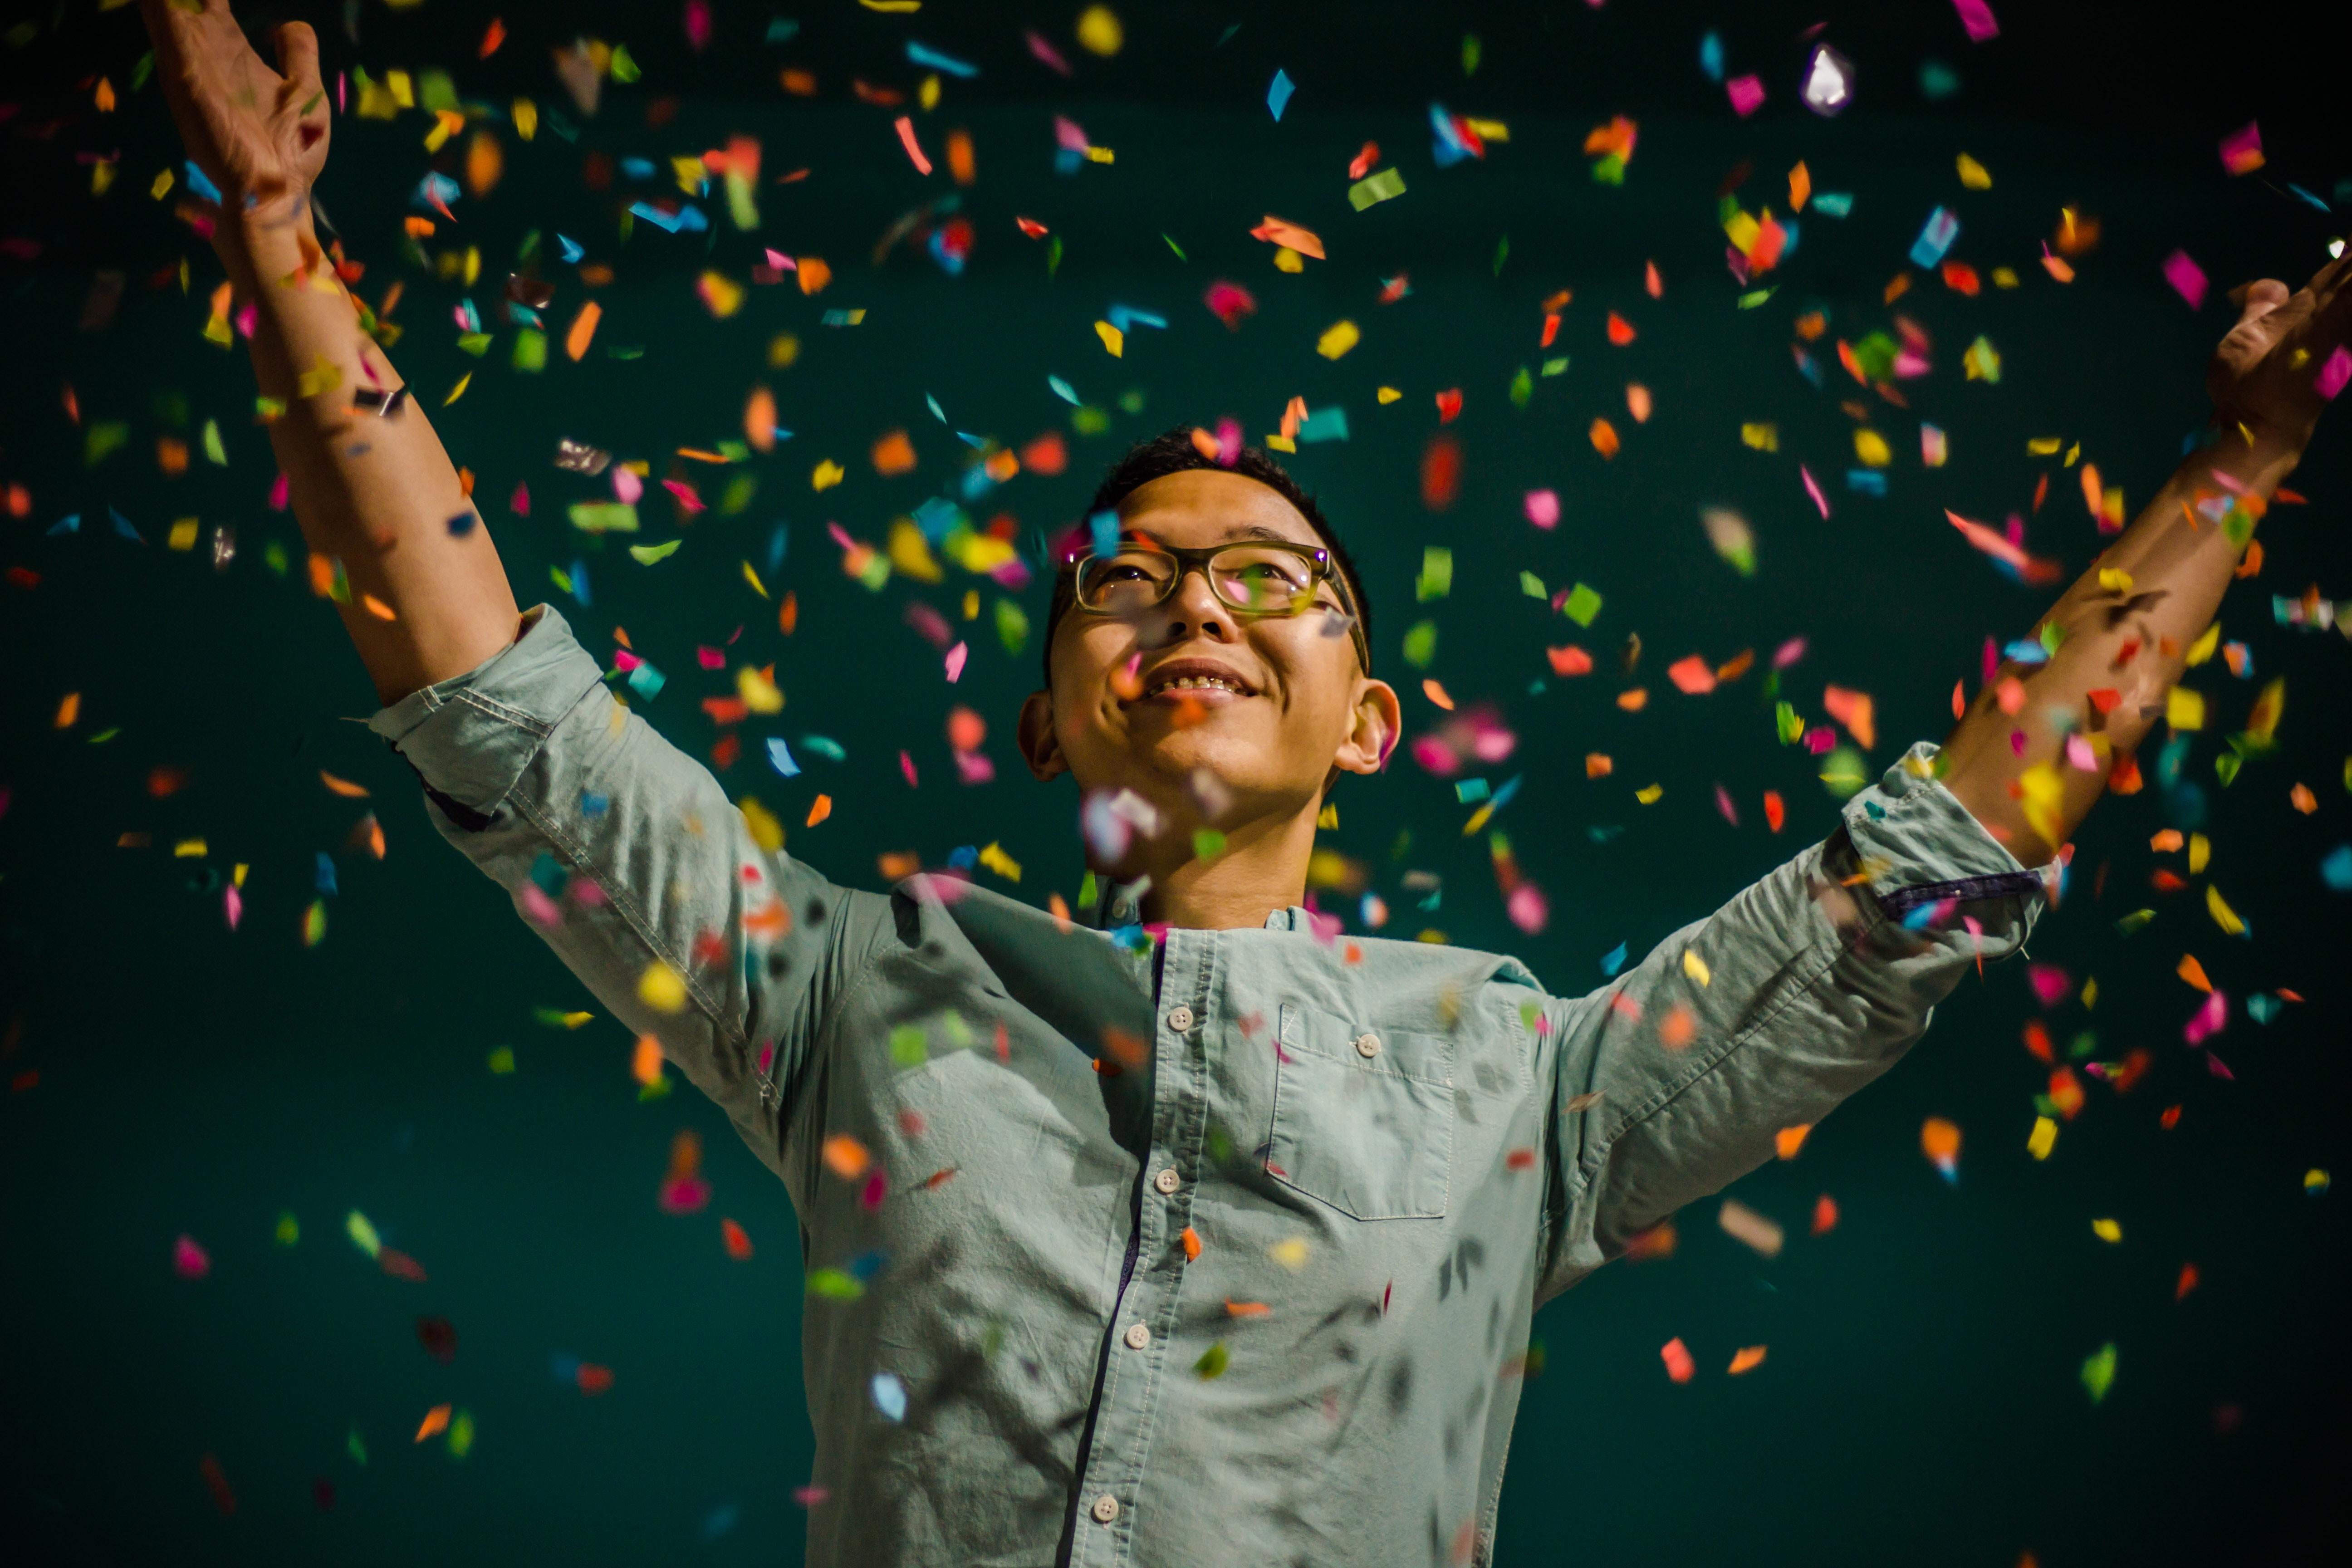 Happy person celebrates their accomplishments with colorful confetti